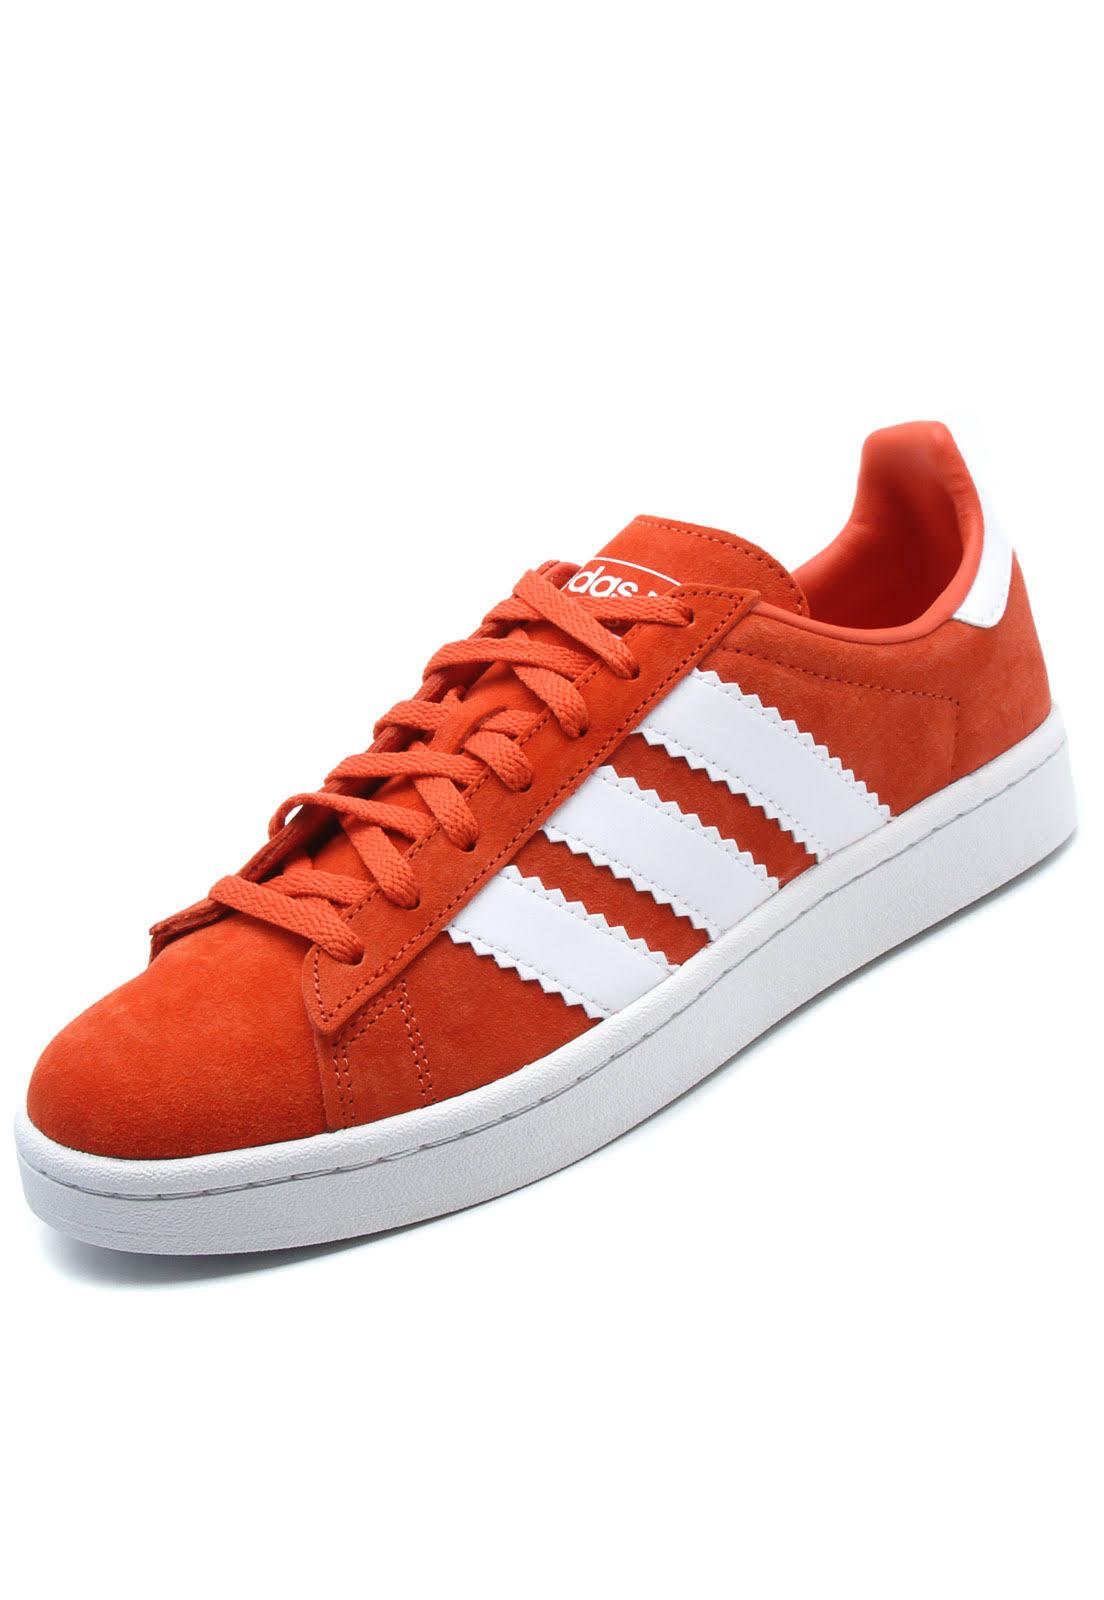 Tennis Tennis Adidas Campus OrangeDames OrangeDames Tennis Adidas Campus Lifestyle Lifestyle Adidas L5AjR4